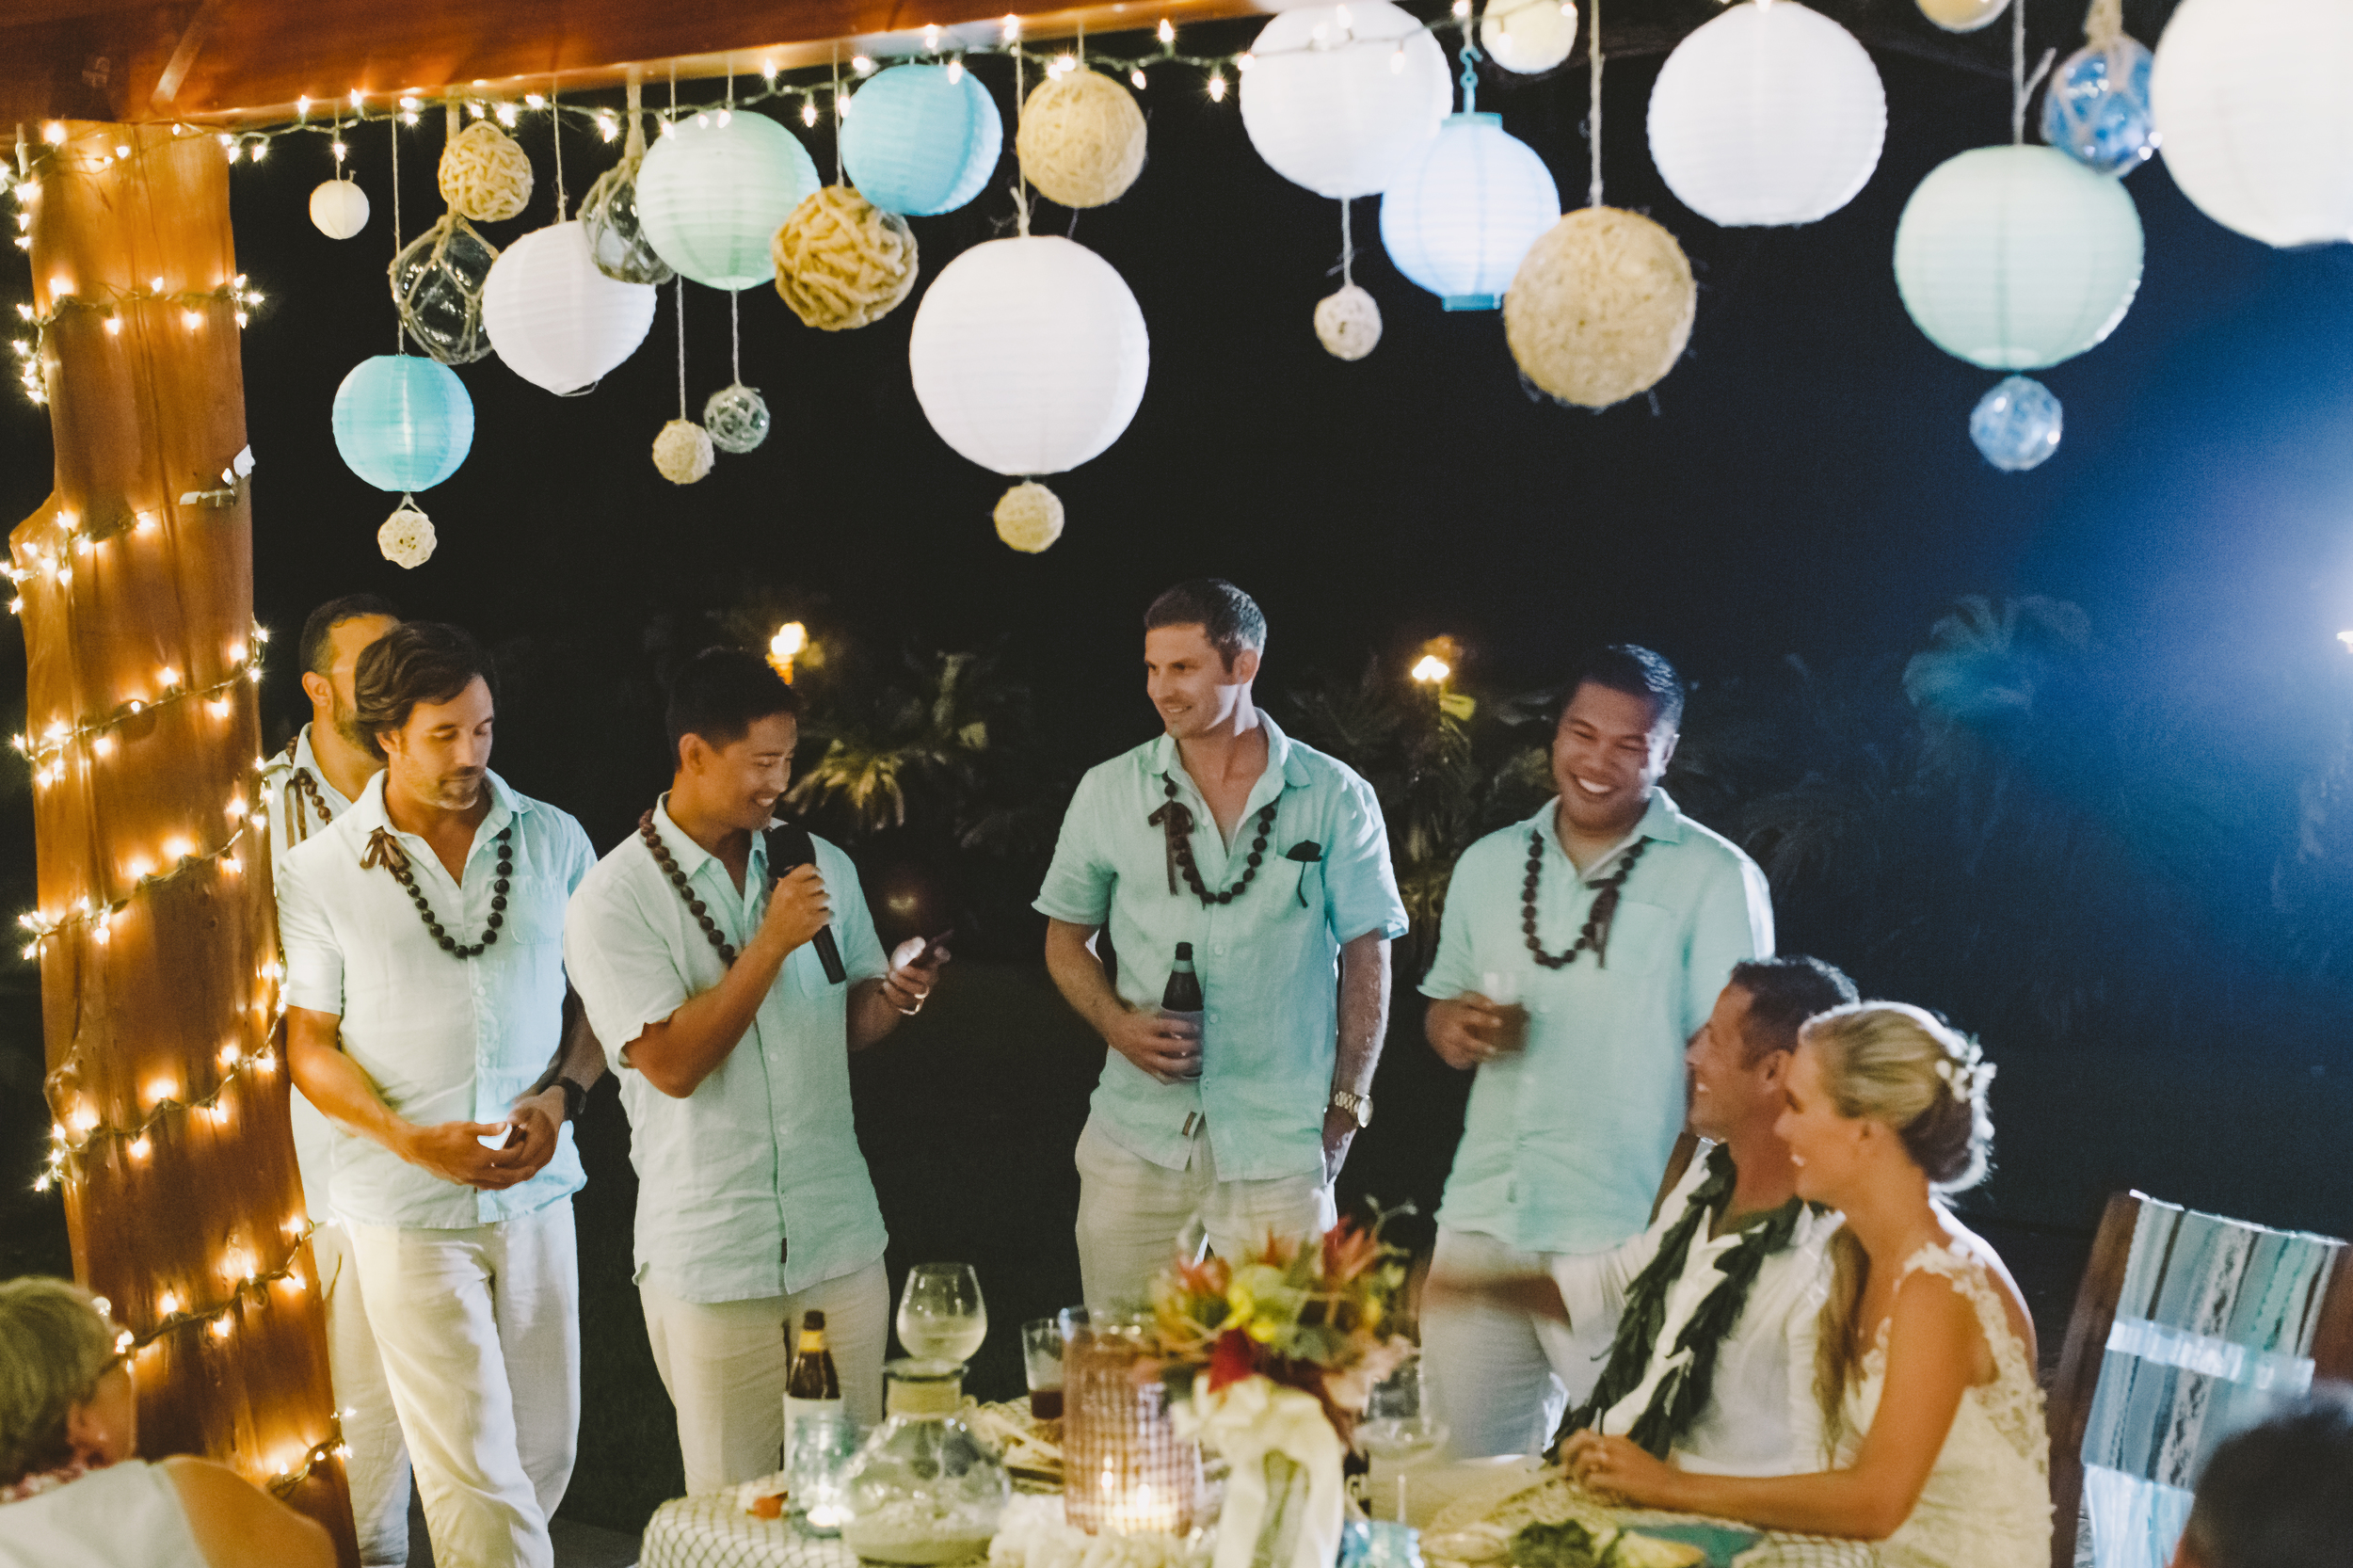 angie-diaz-photography-hawaii-wedding-photographer-kelli-jay-124.jpg